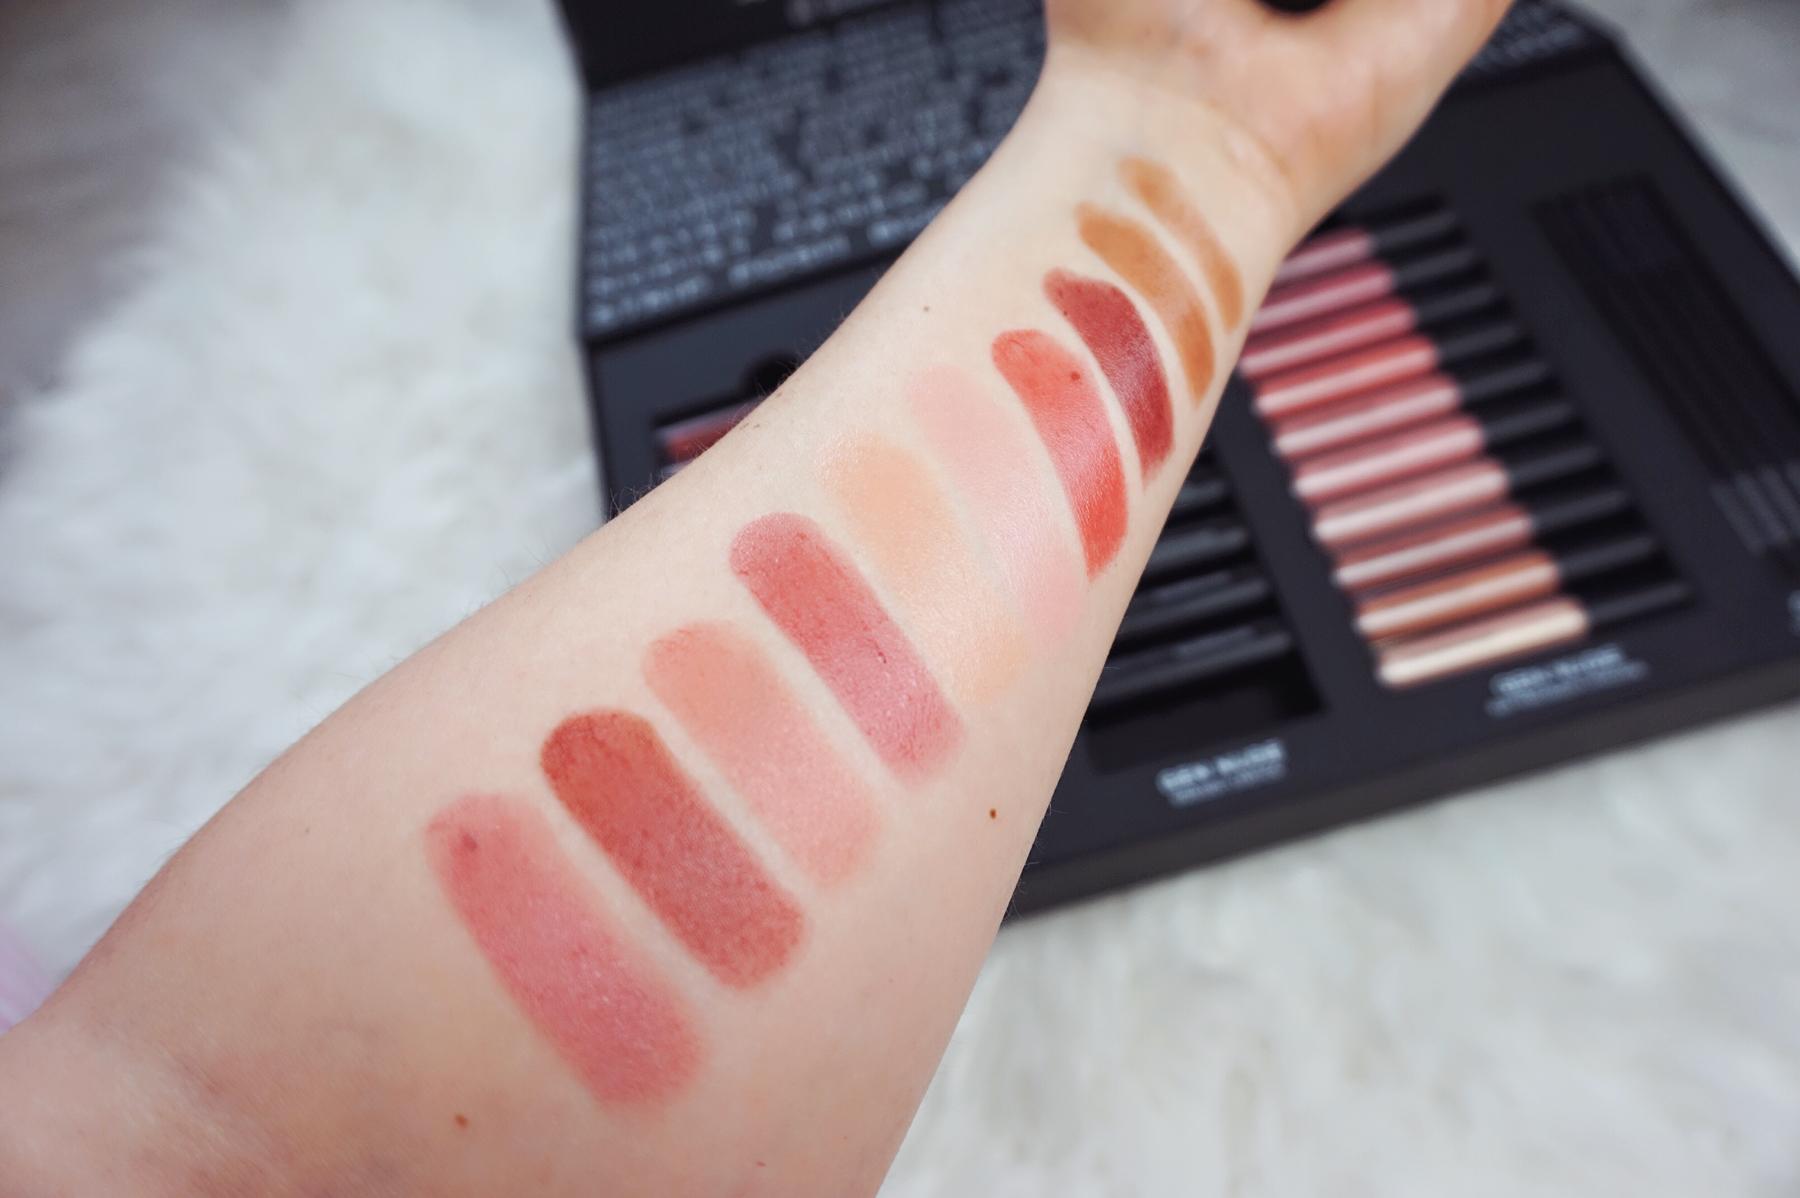 bareminerals_lippenstifte_lippenprodukte_swatches_liquid_lipstick_lipgloss_itsgoldie_beauty_schminke_makeup_blogger_blog_hannover